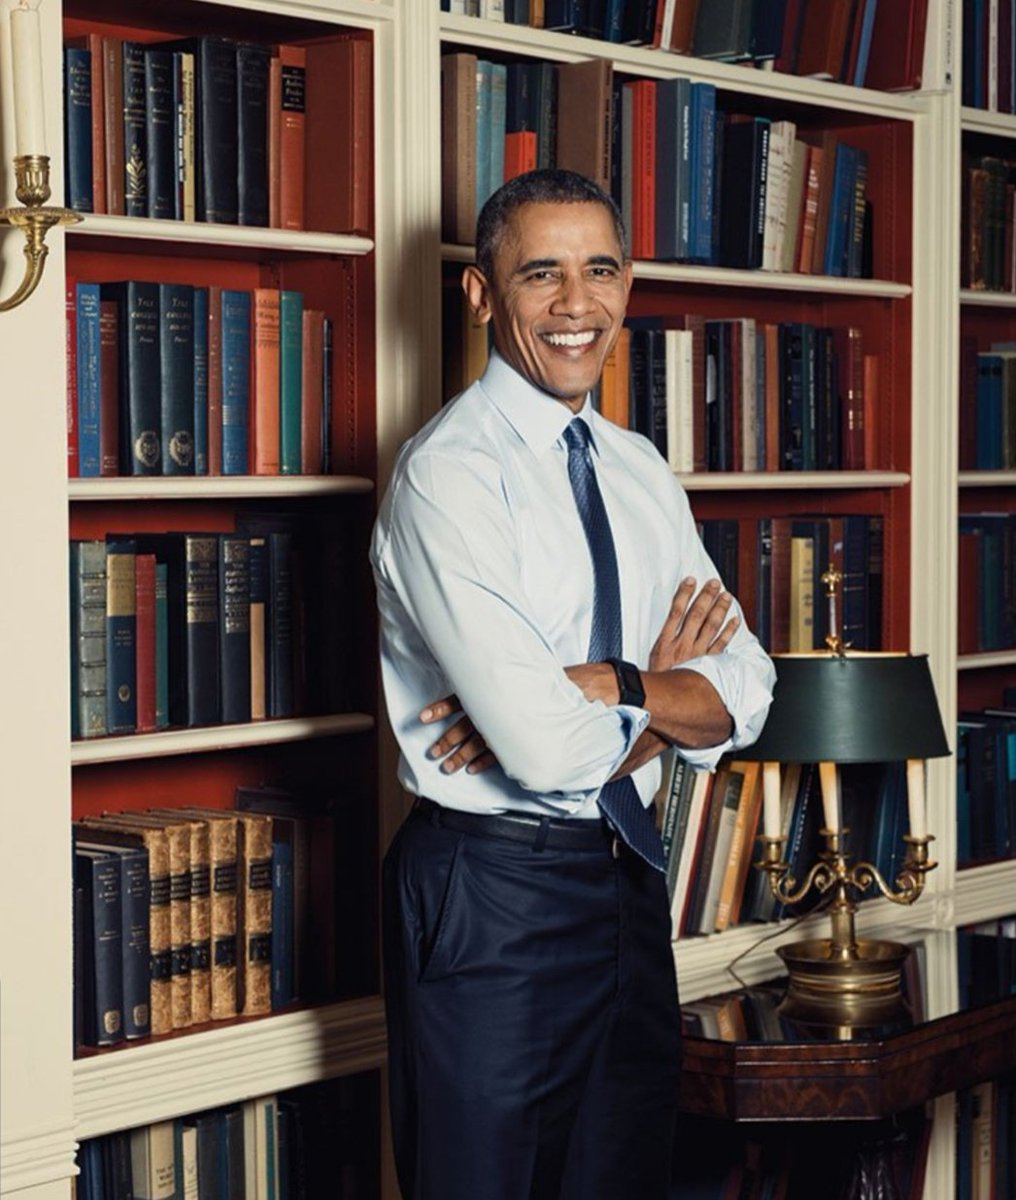 President Obama's still my president until further notice.Point BlankPERIODTpic.twitter.com/reDgMZPSmW